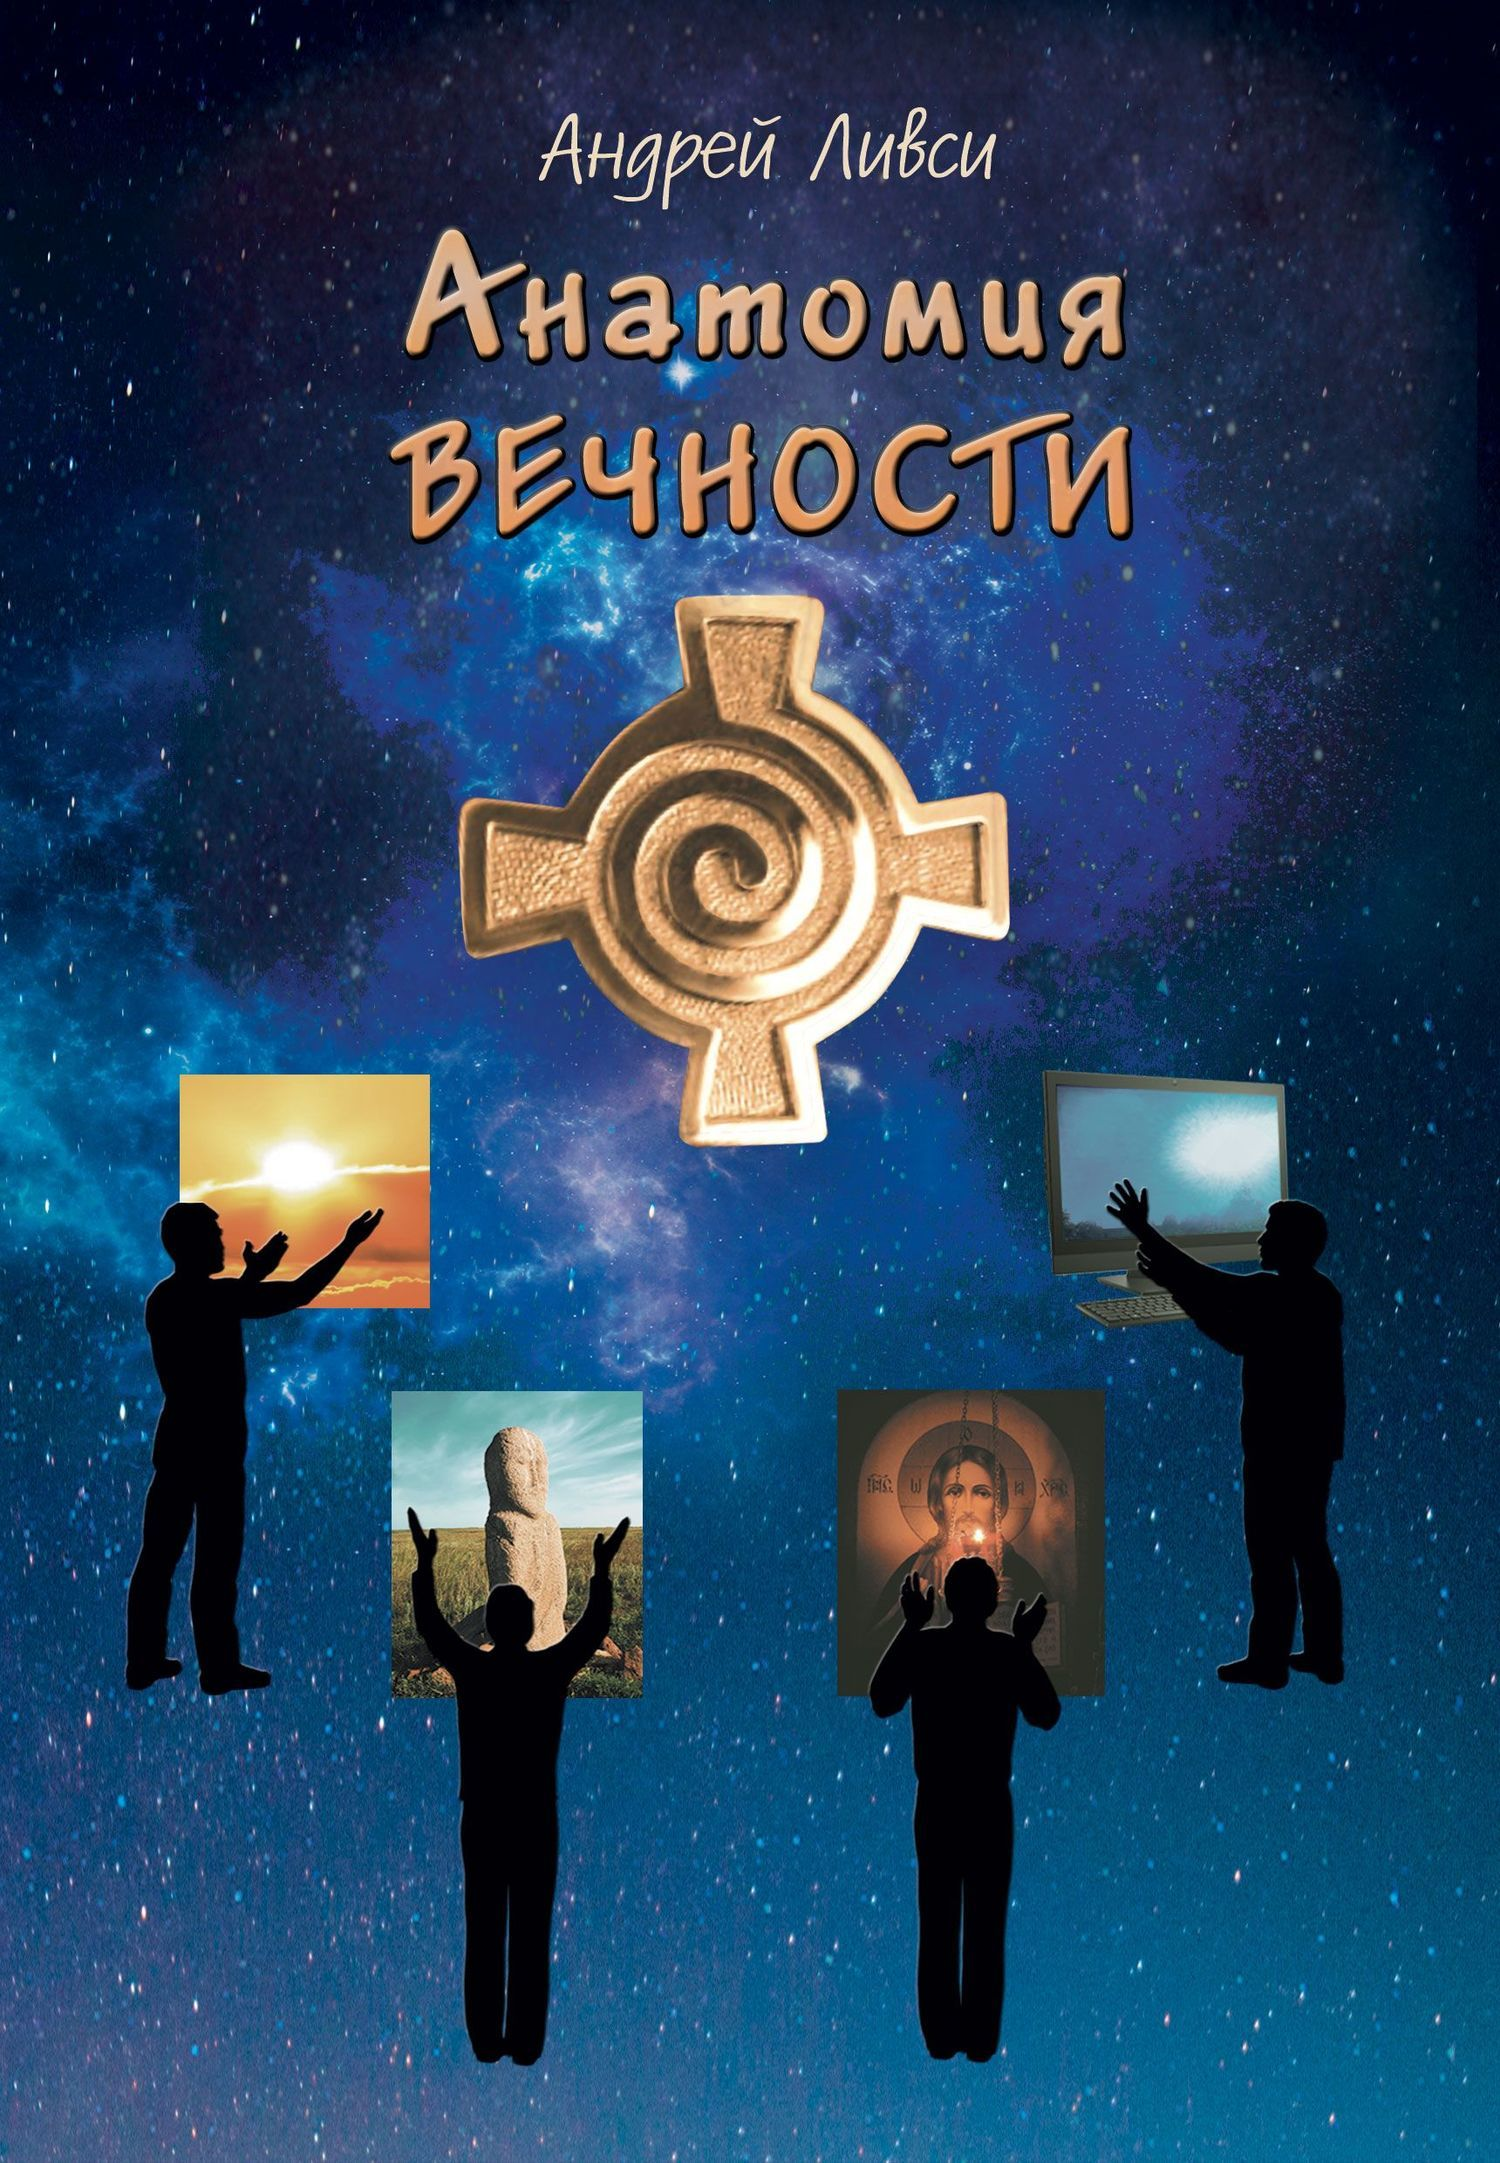 Андрей Ливси - Анатомия вечности